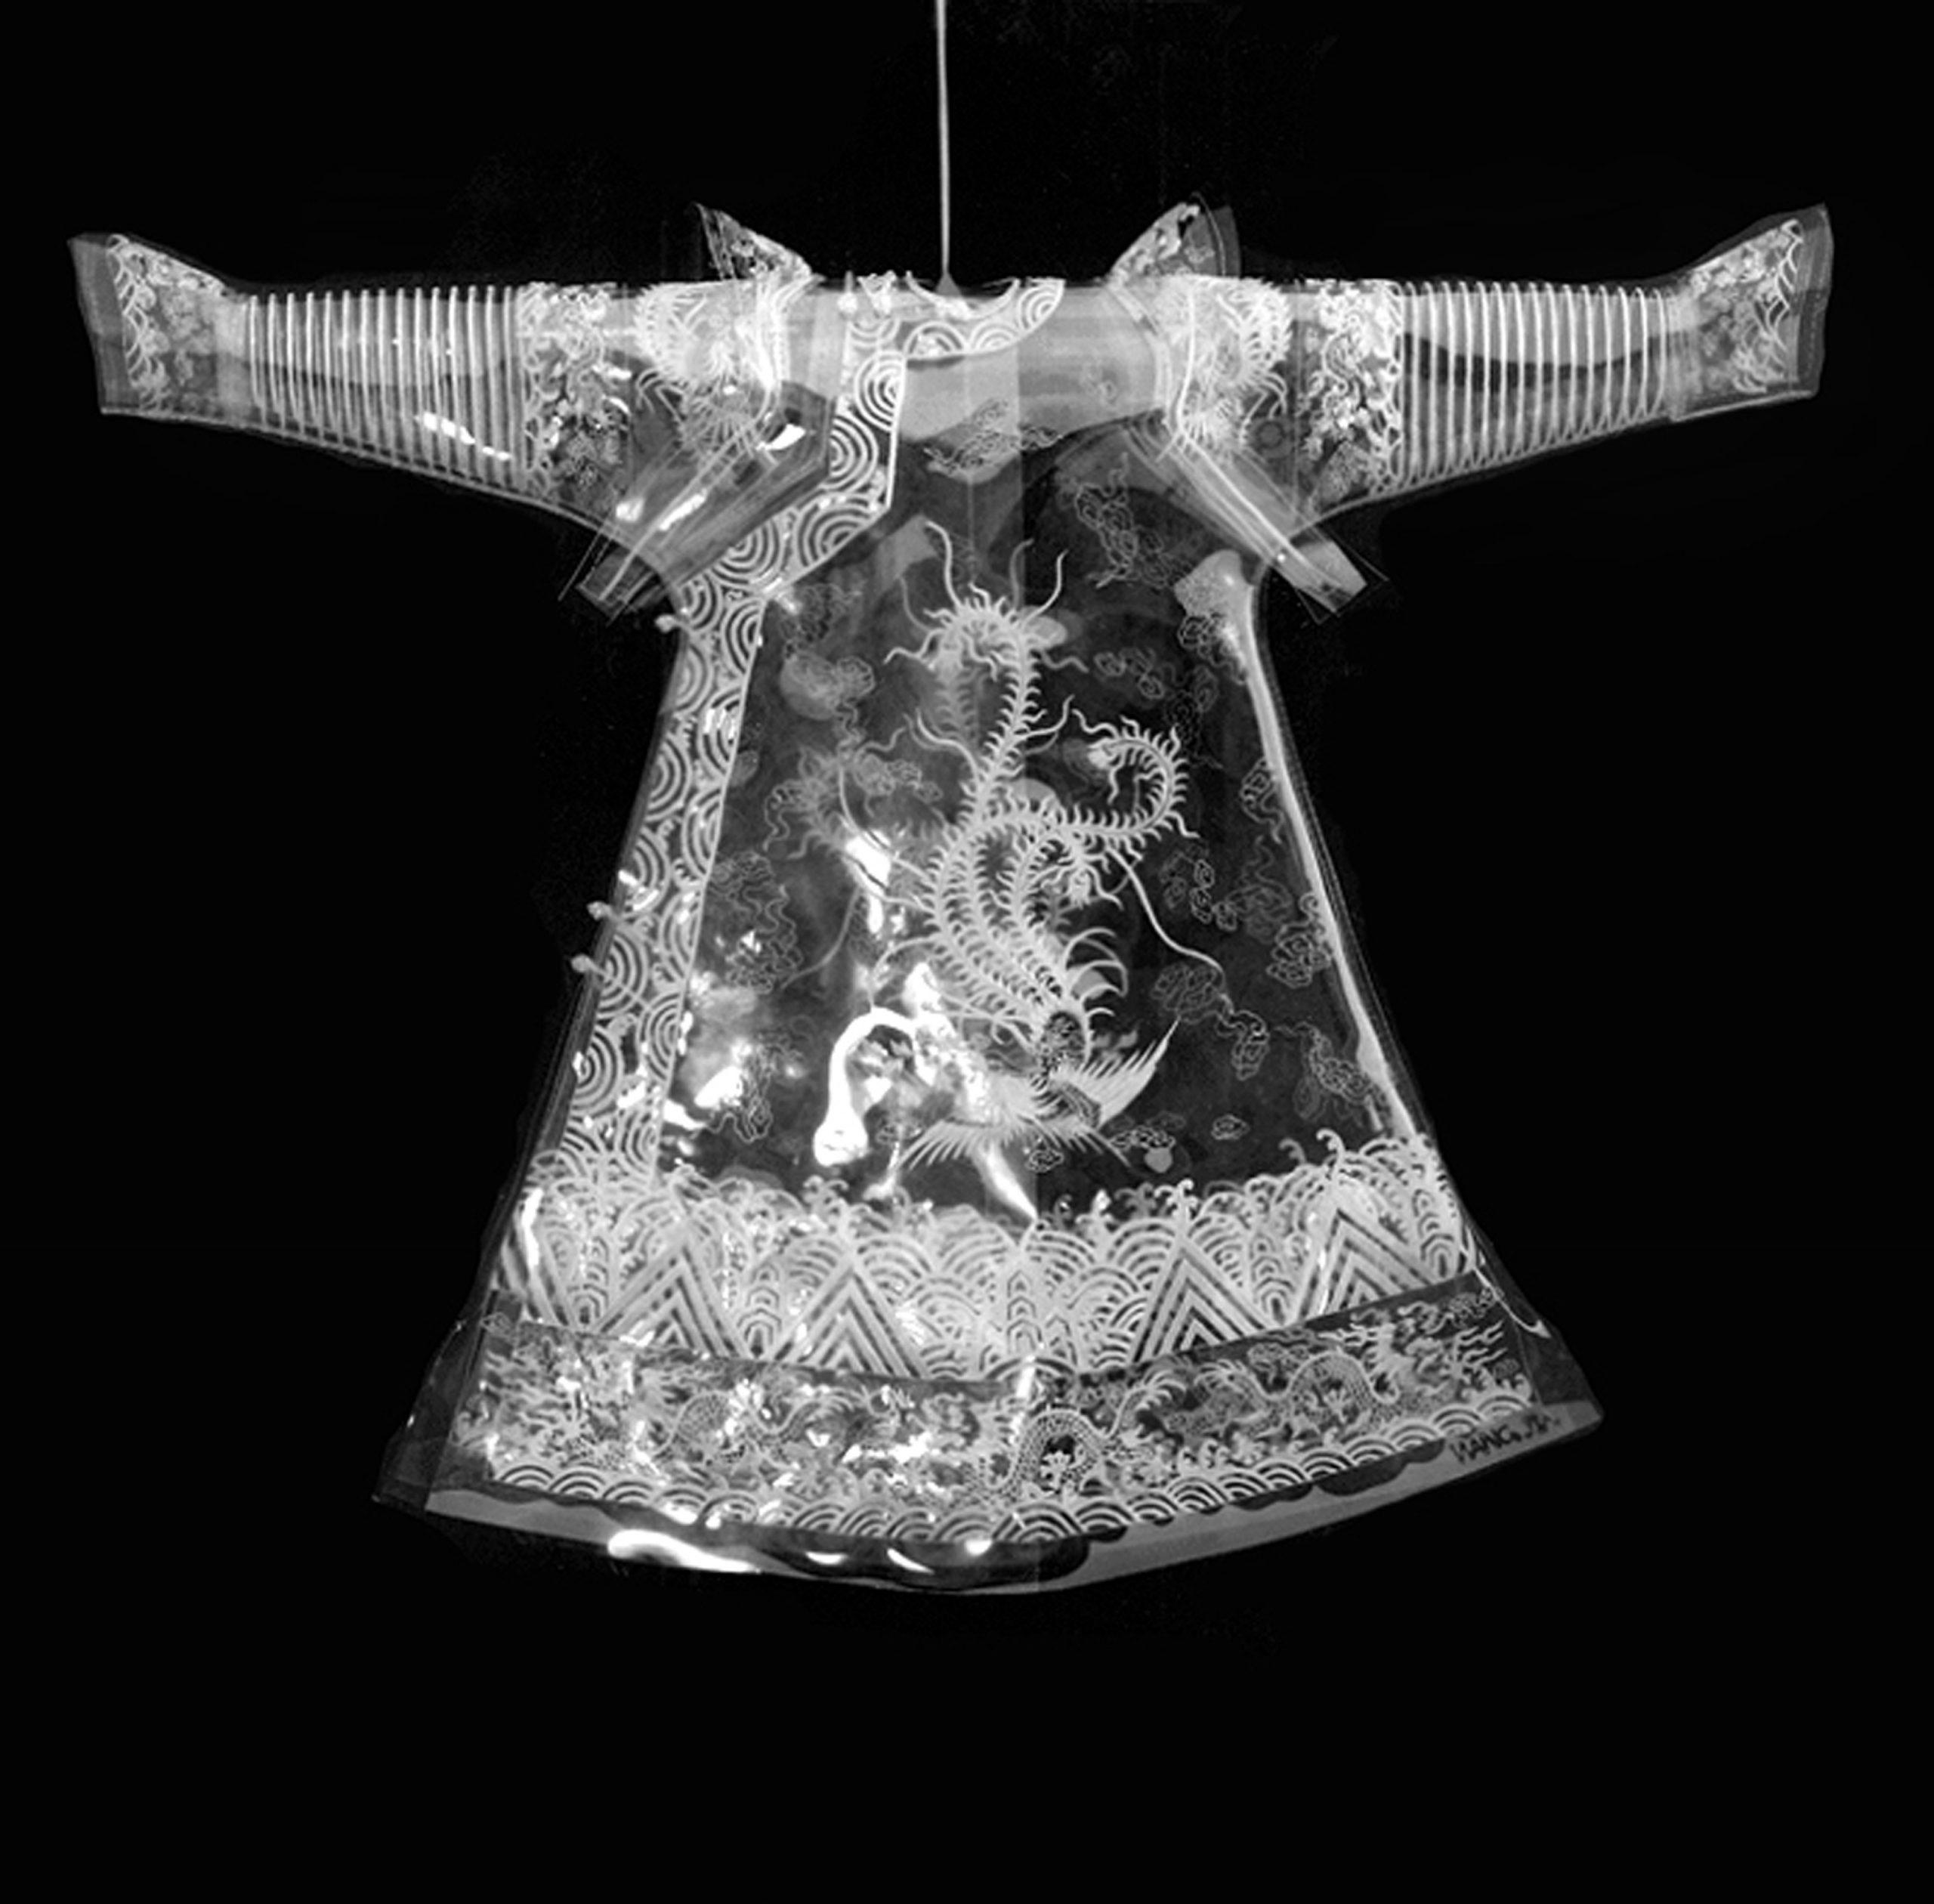 Wang Jin, Chinese Dream, 2006. Photo courtesy of Friedman Benda.